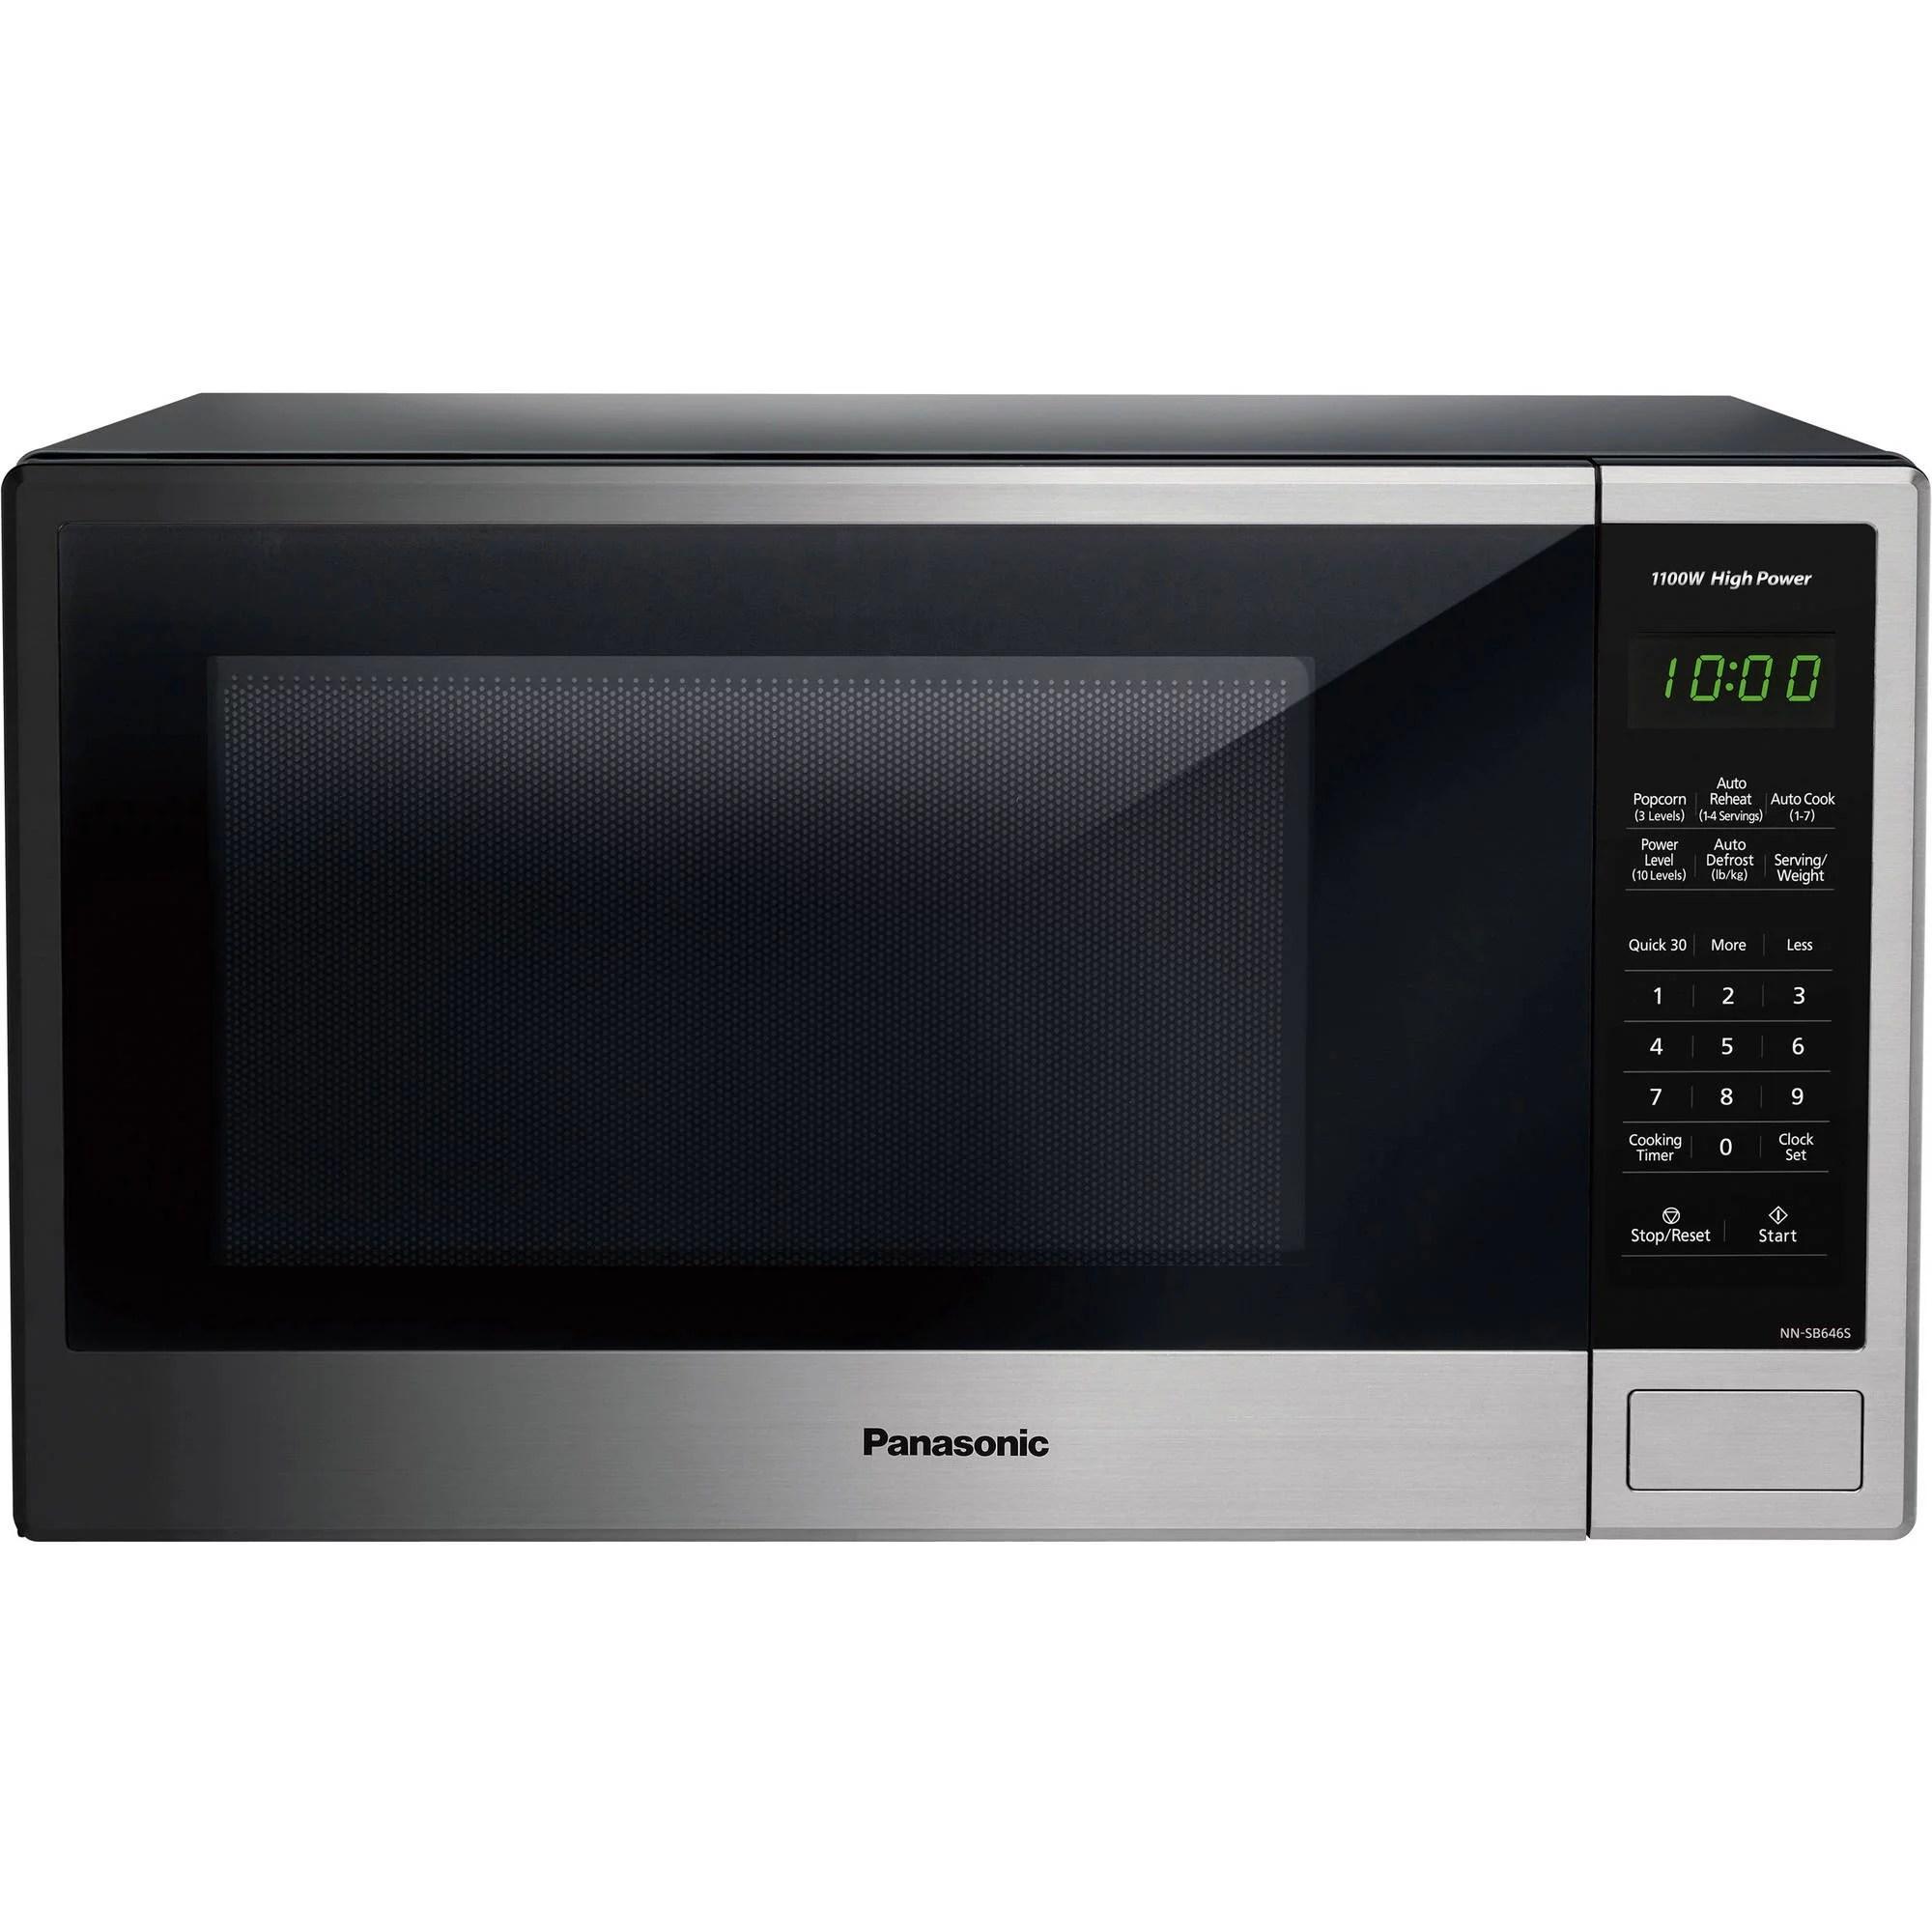 panasonic 1 3 cu ft 1100w countertop stainless steel microwave oven with genius sensor